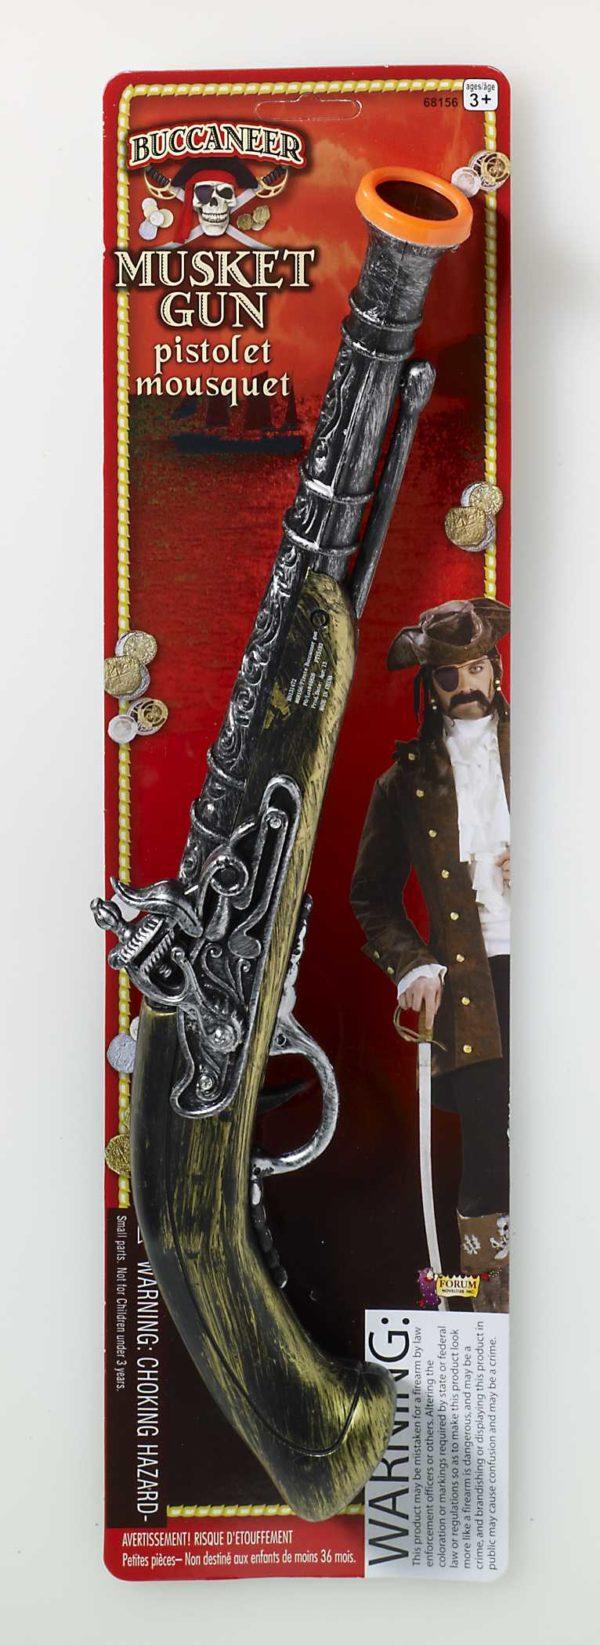 Musket Gun Pistol 1